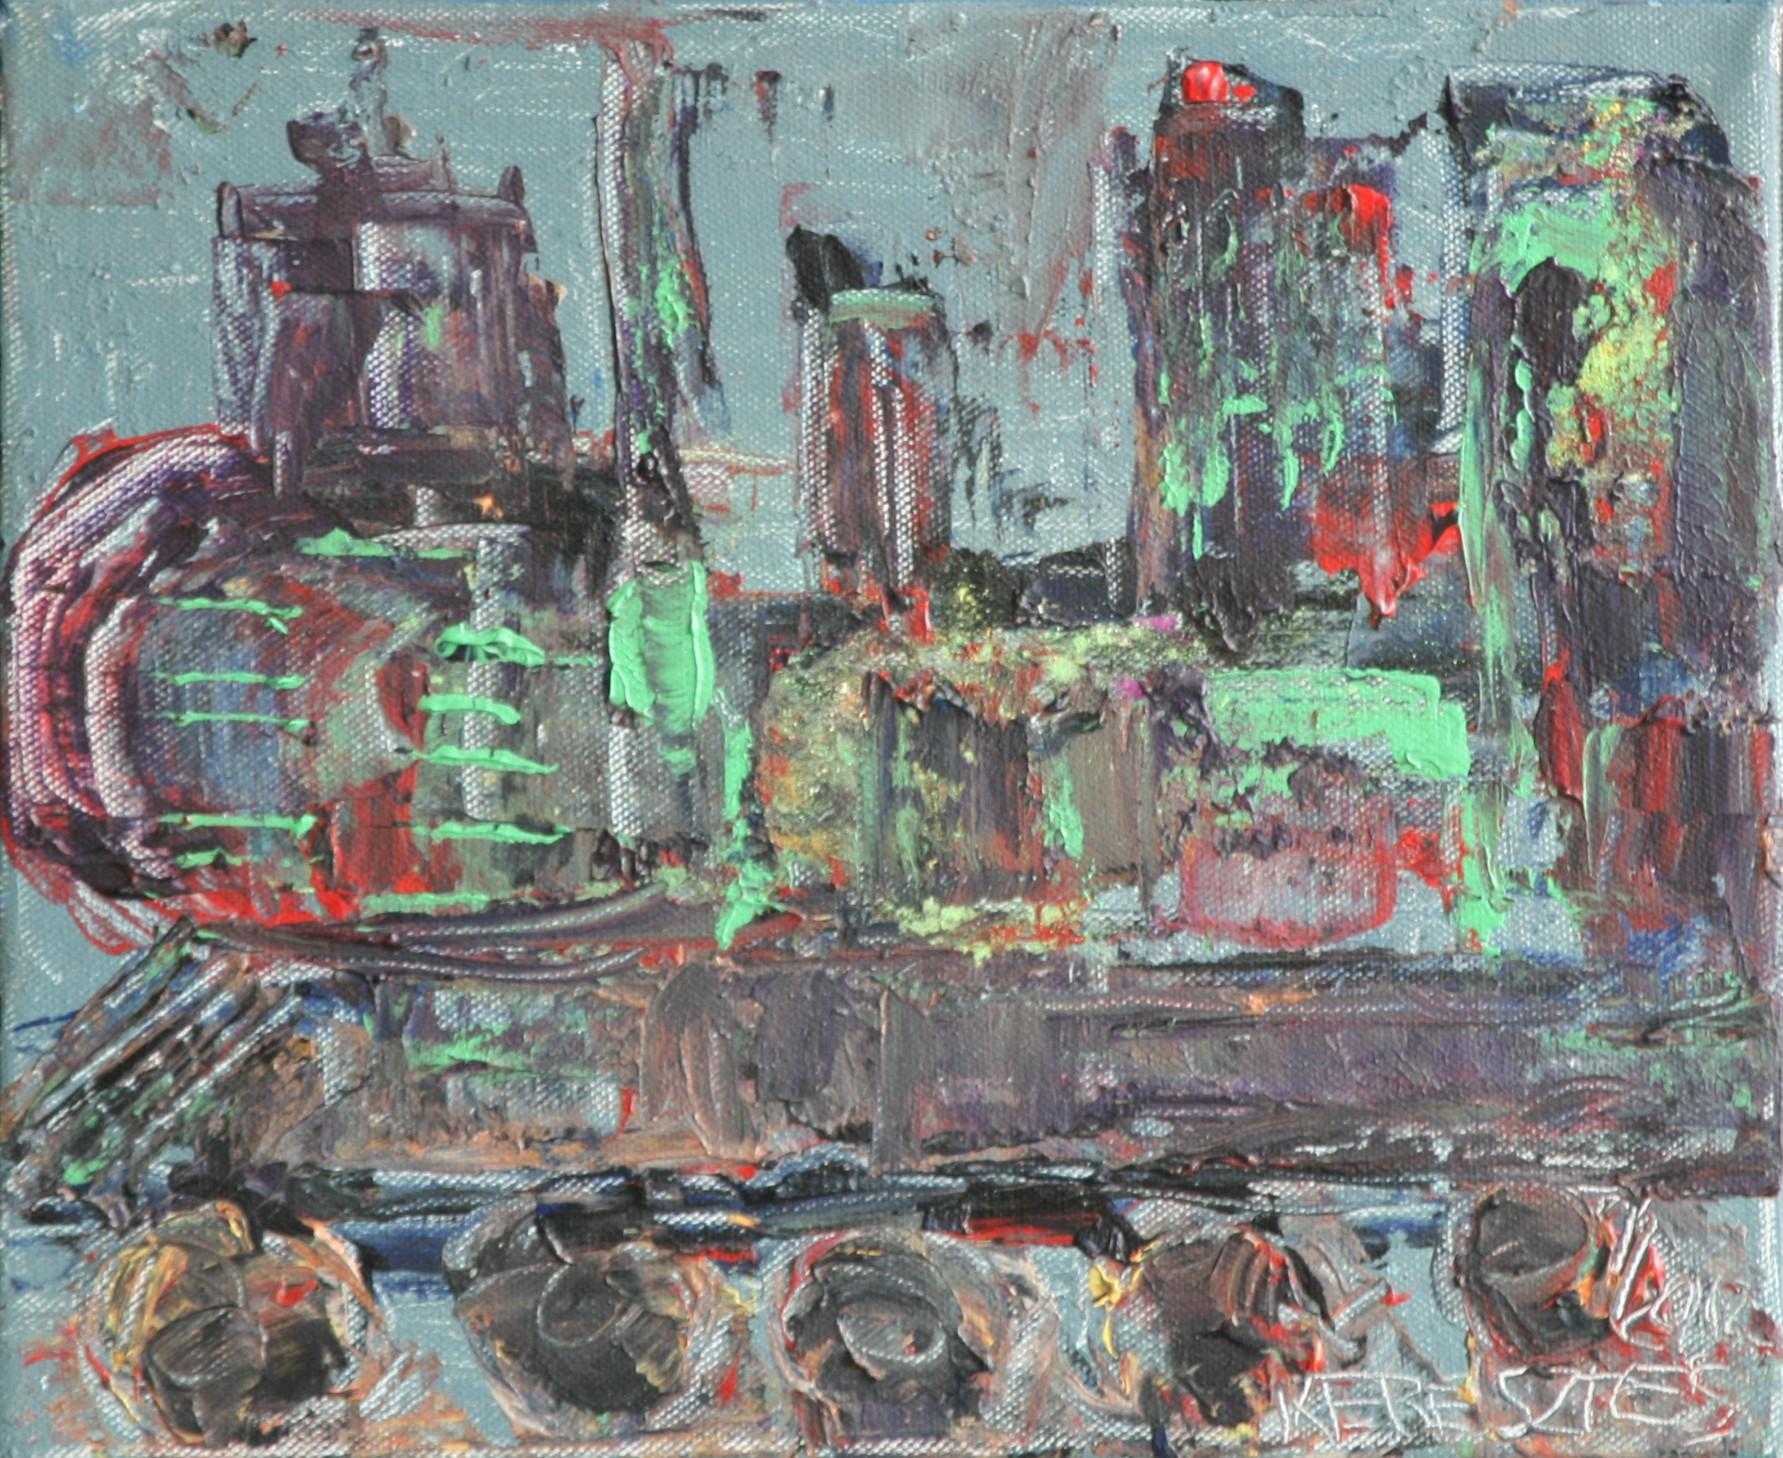 toile 2 - magdalena keresztes, artiste peintre à amiens